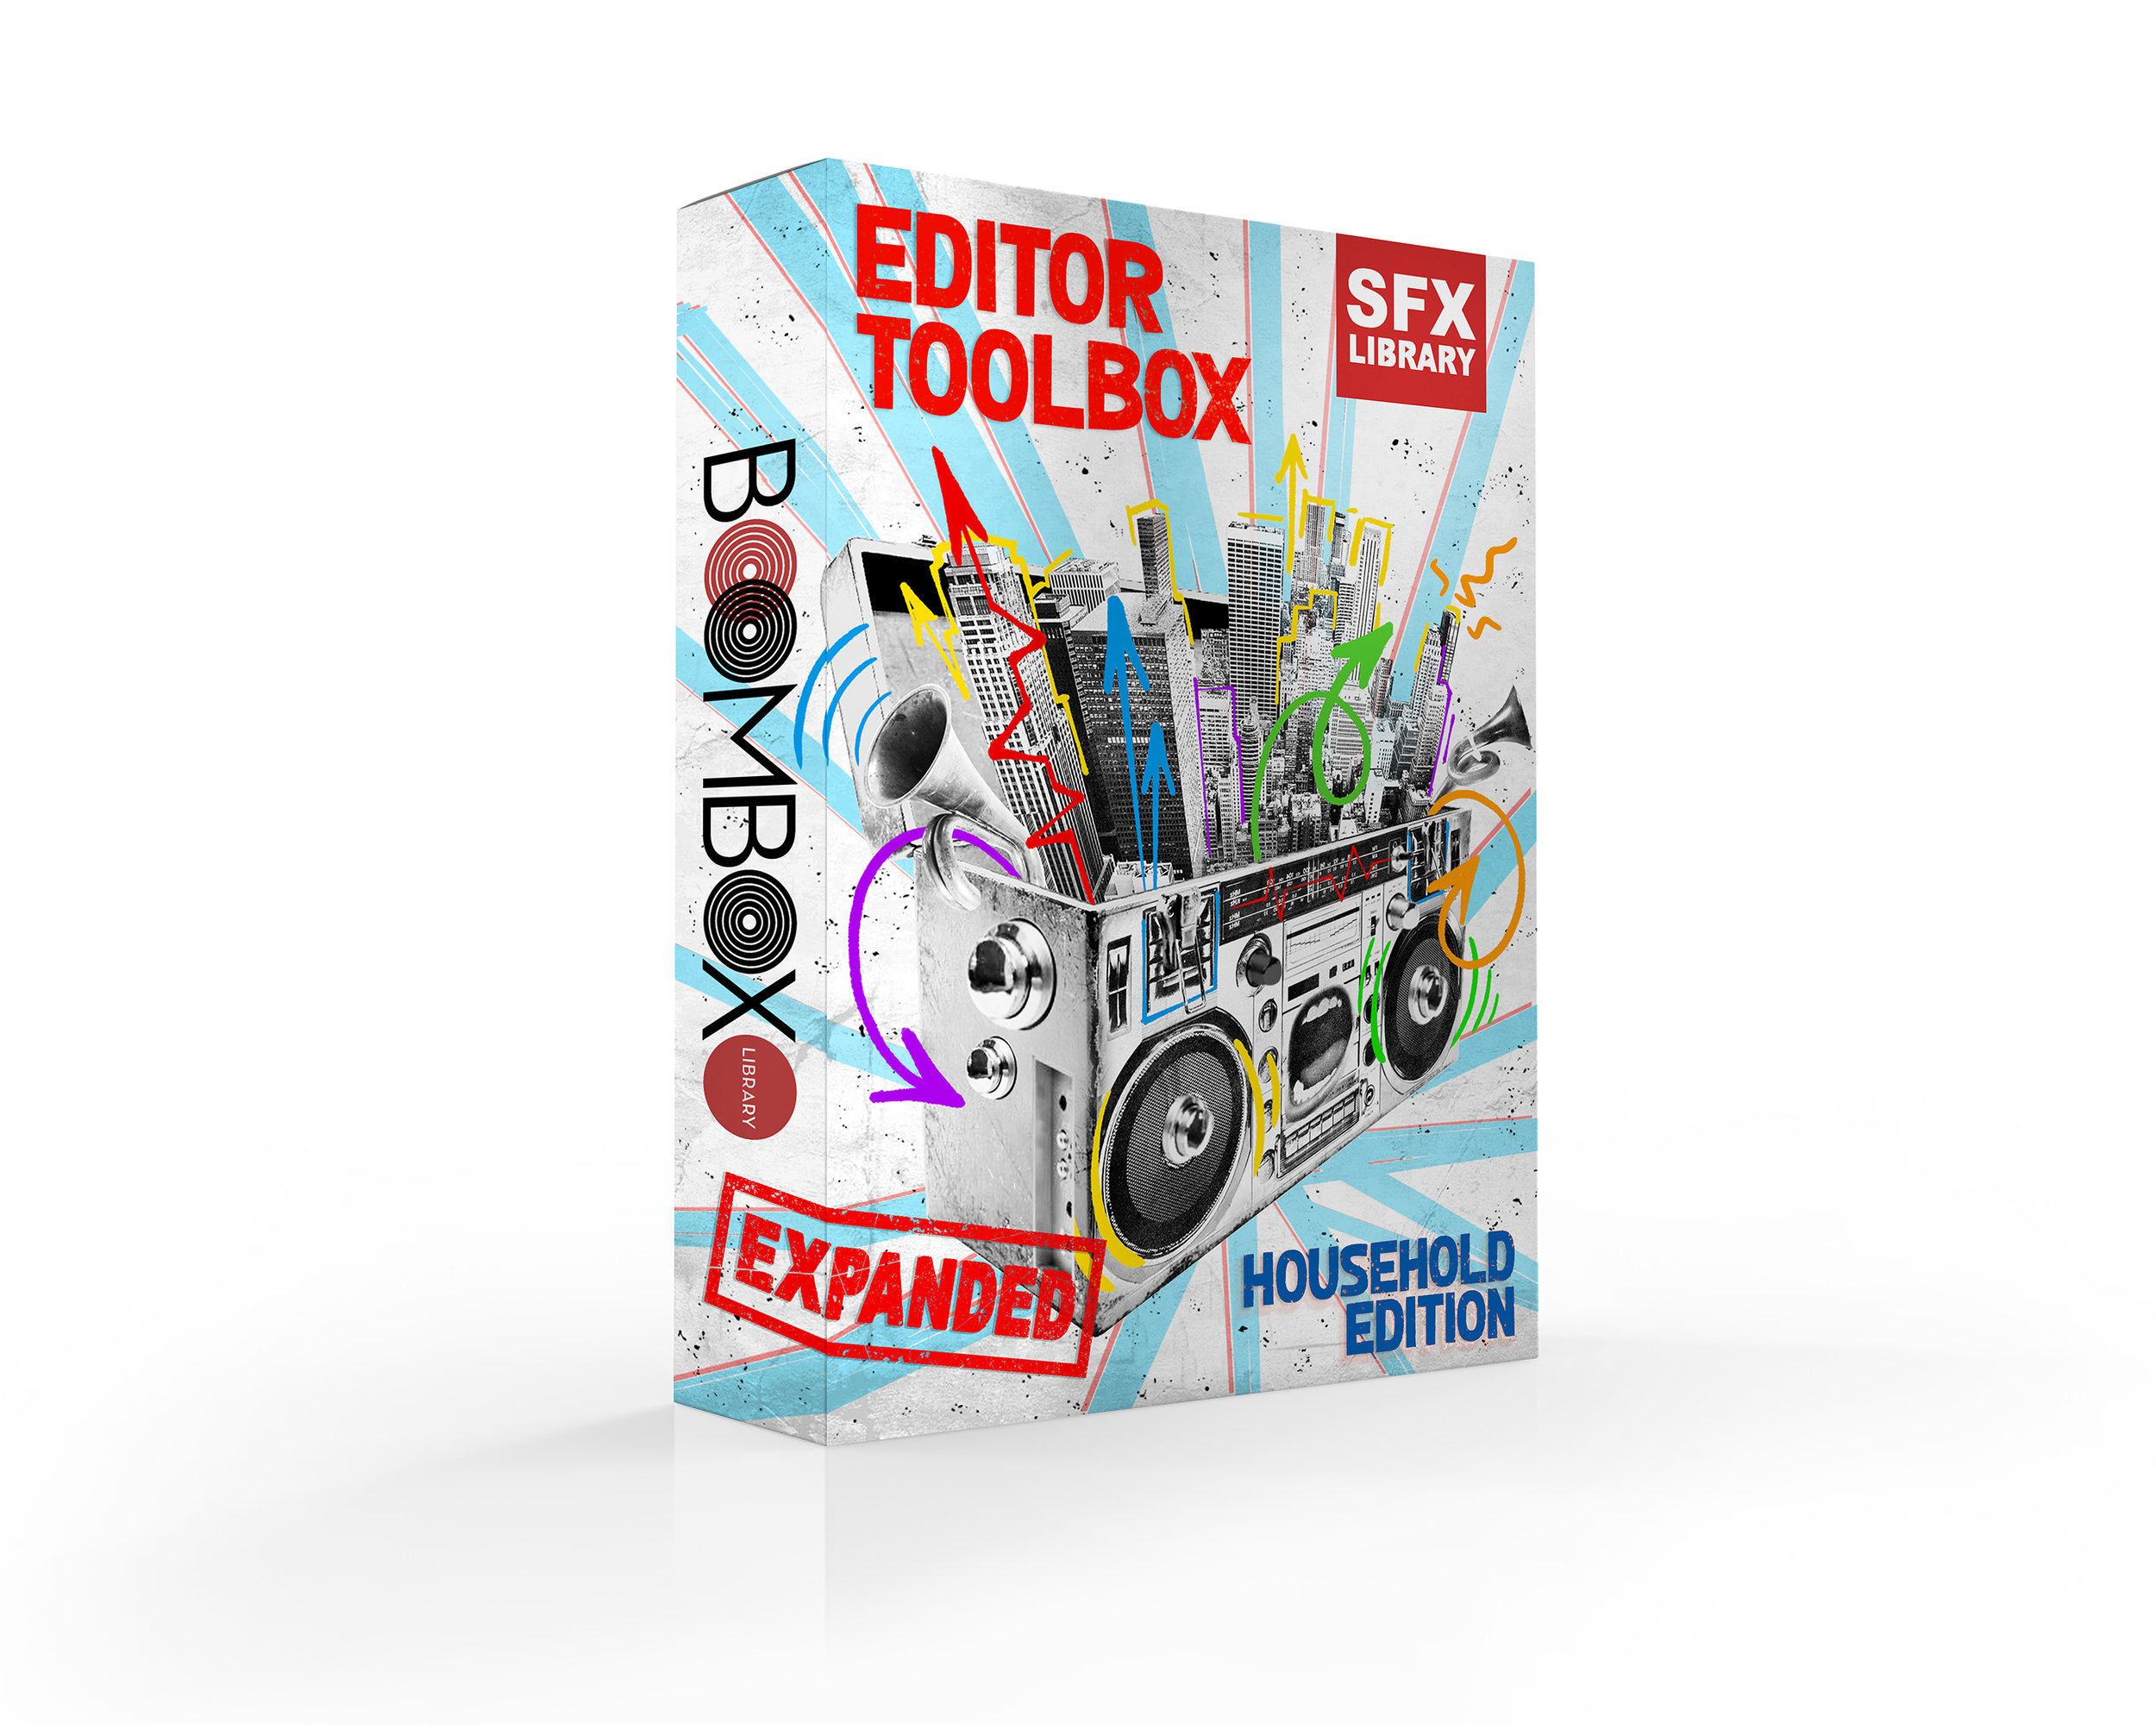 EDITOR TOOLBOX - 3D BOX EXPANDED.jpg